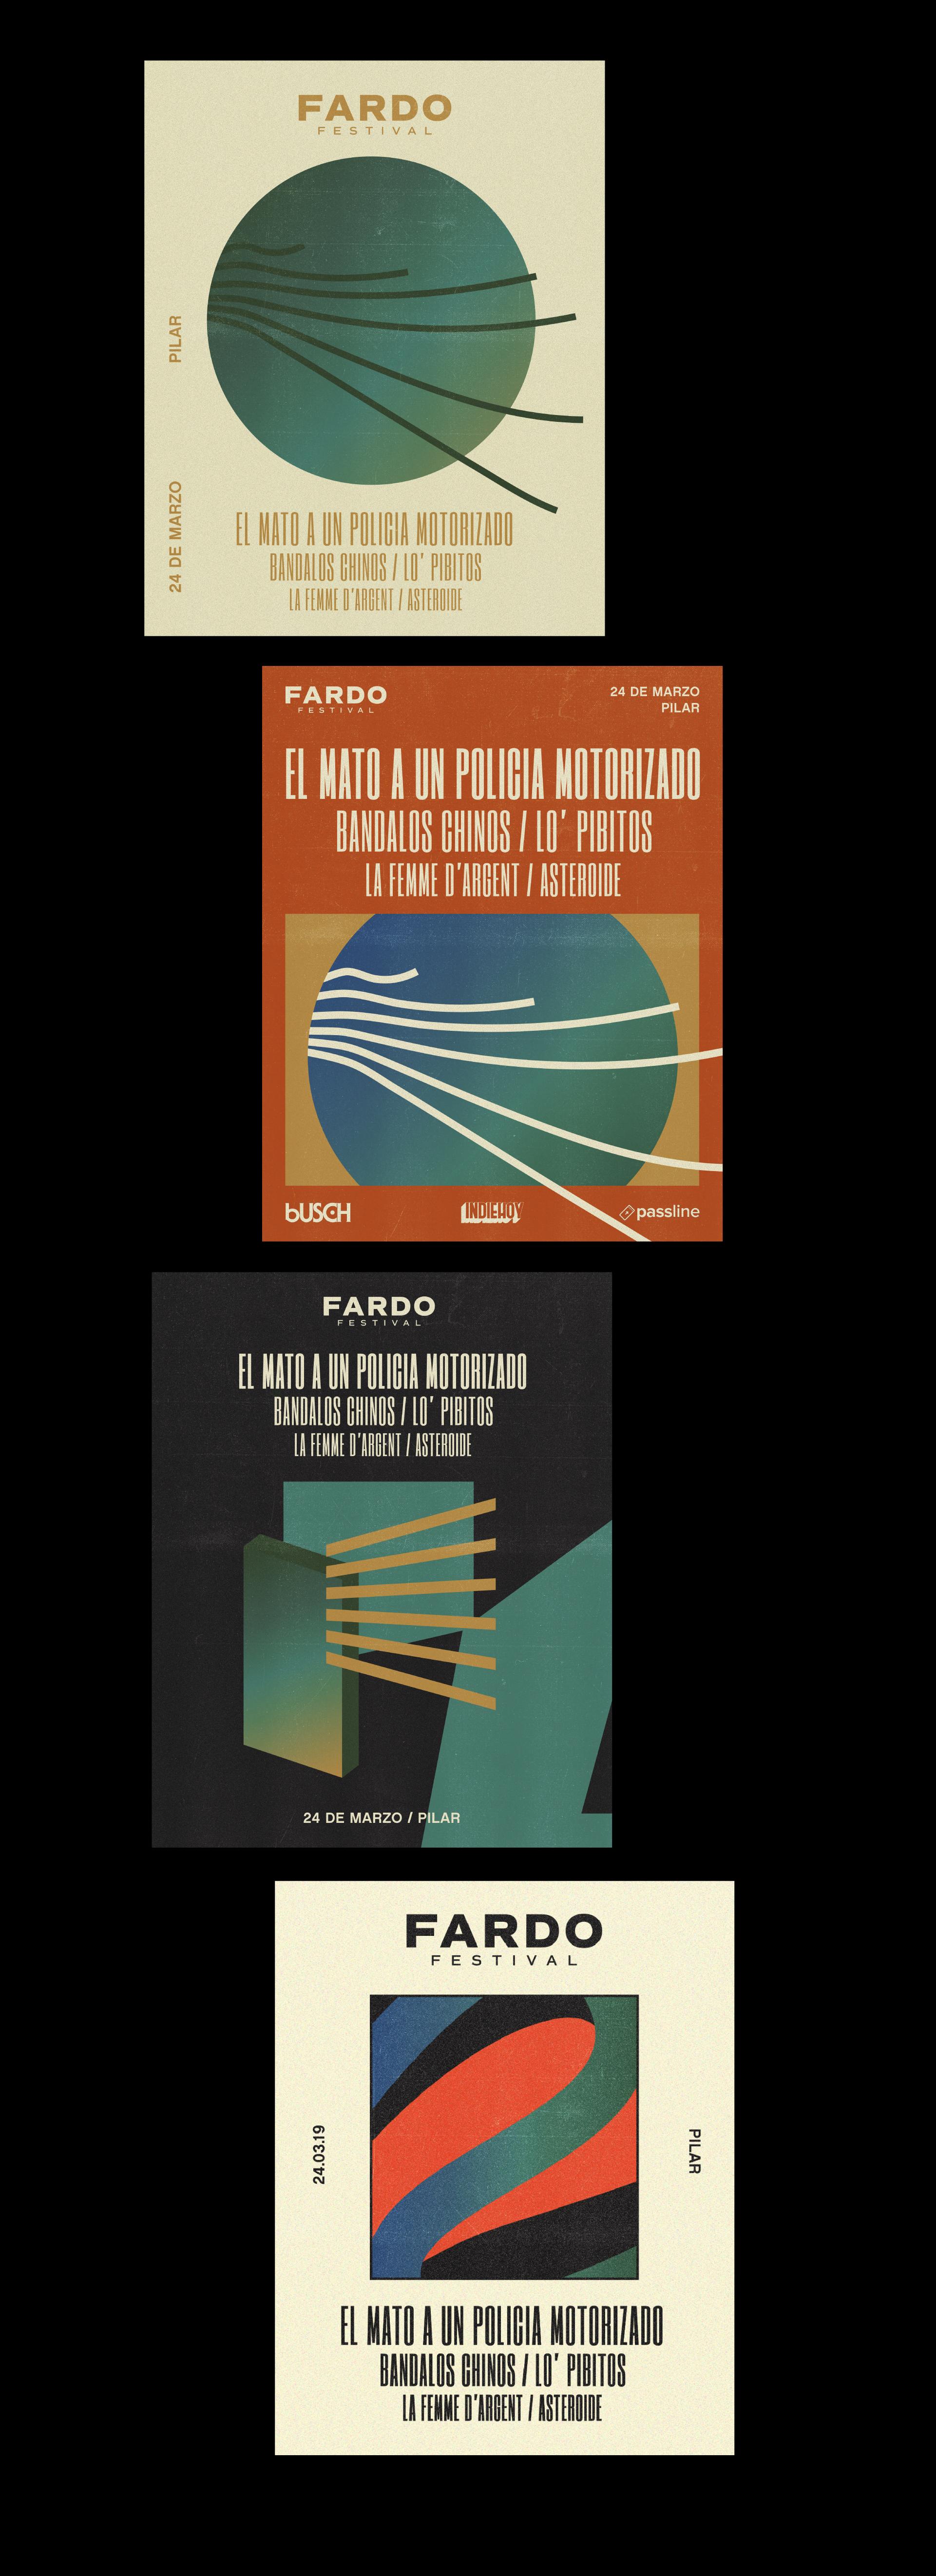 FARDO_BEHANCE-01